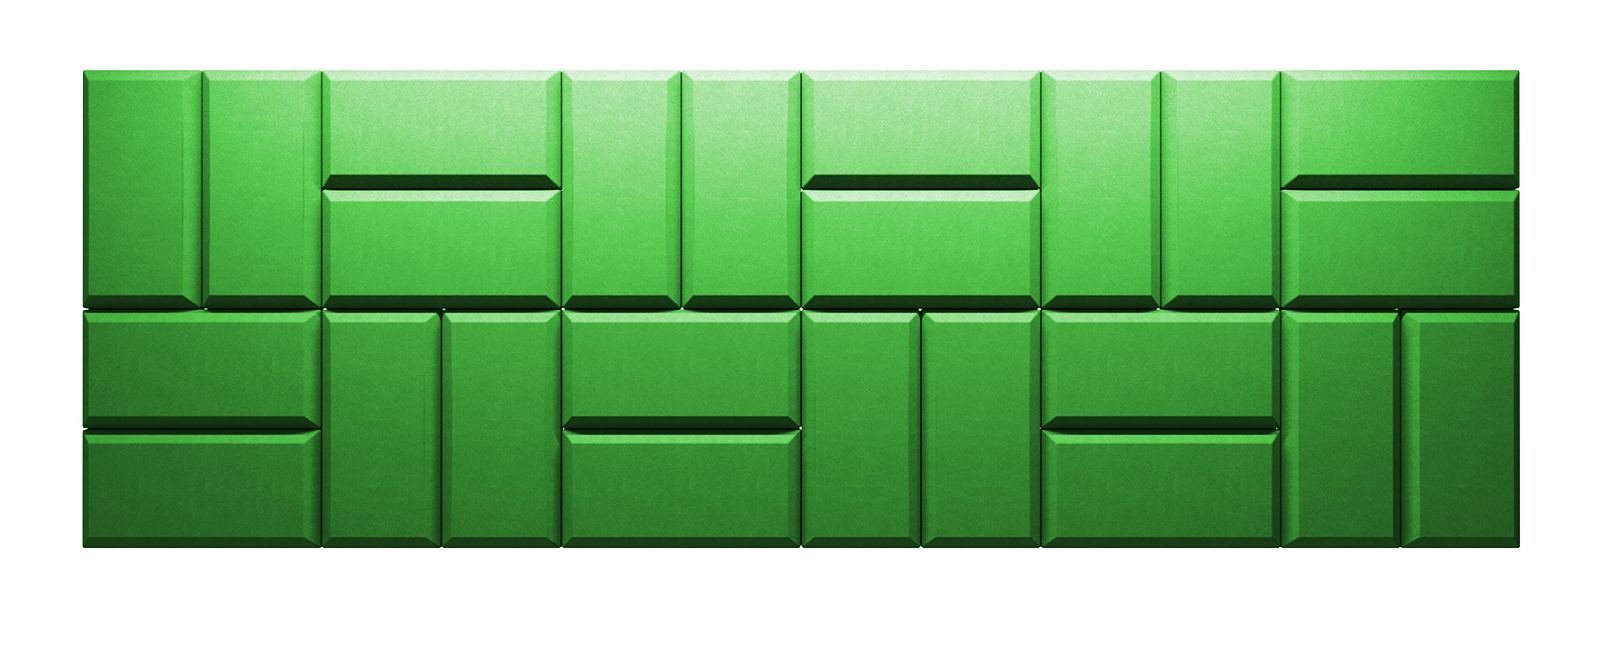 Autex Quietspace 3D Tiles S-5.50 | Granny Smith